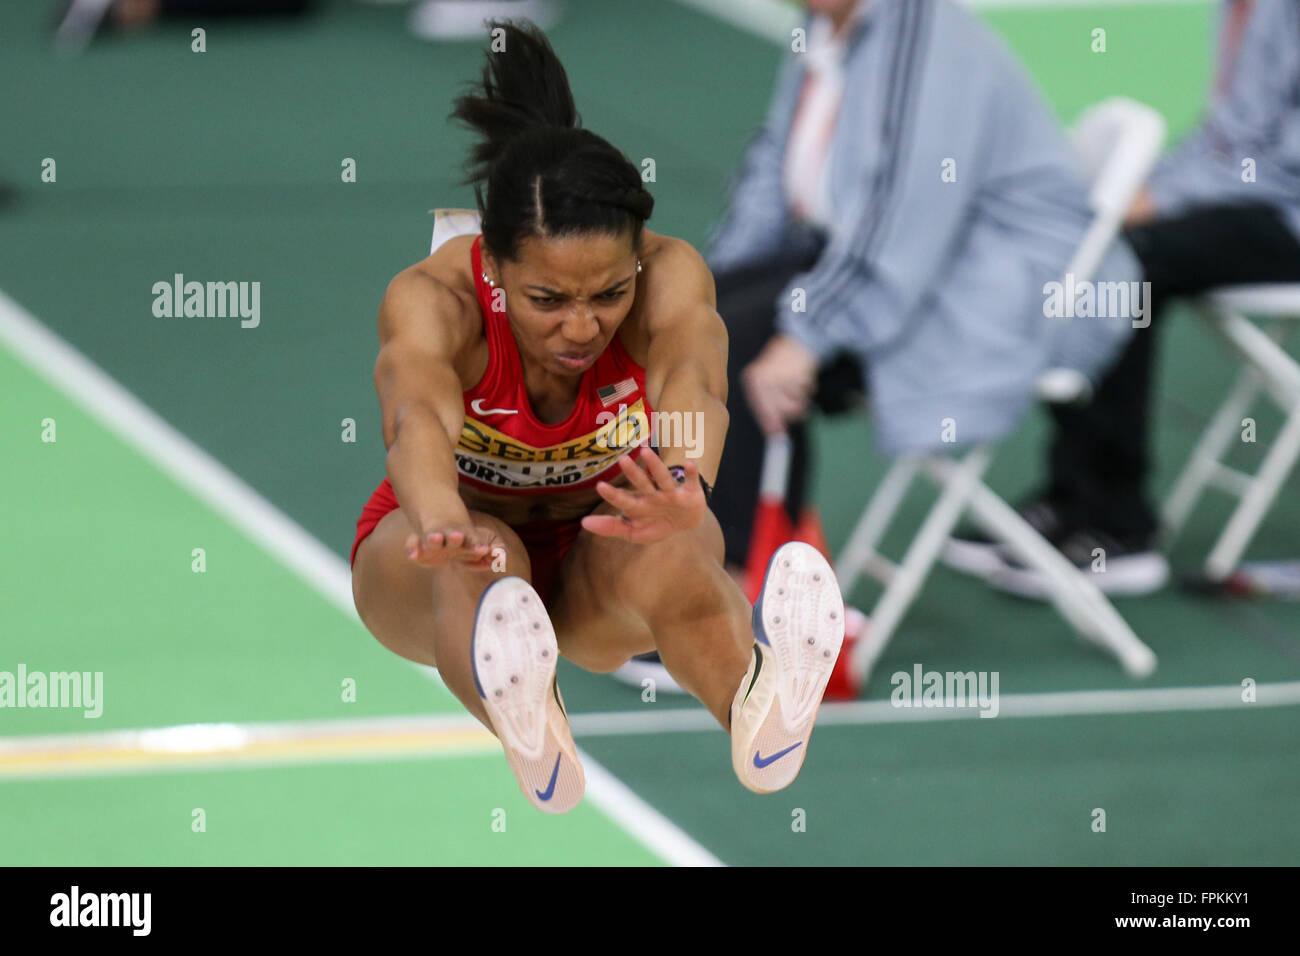 Portland, Oregon, USA springt 18. März 2016 - KENDELL WILLIAMS im Fünfkampf bei der 2016 Indoor & Stockbild